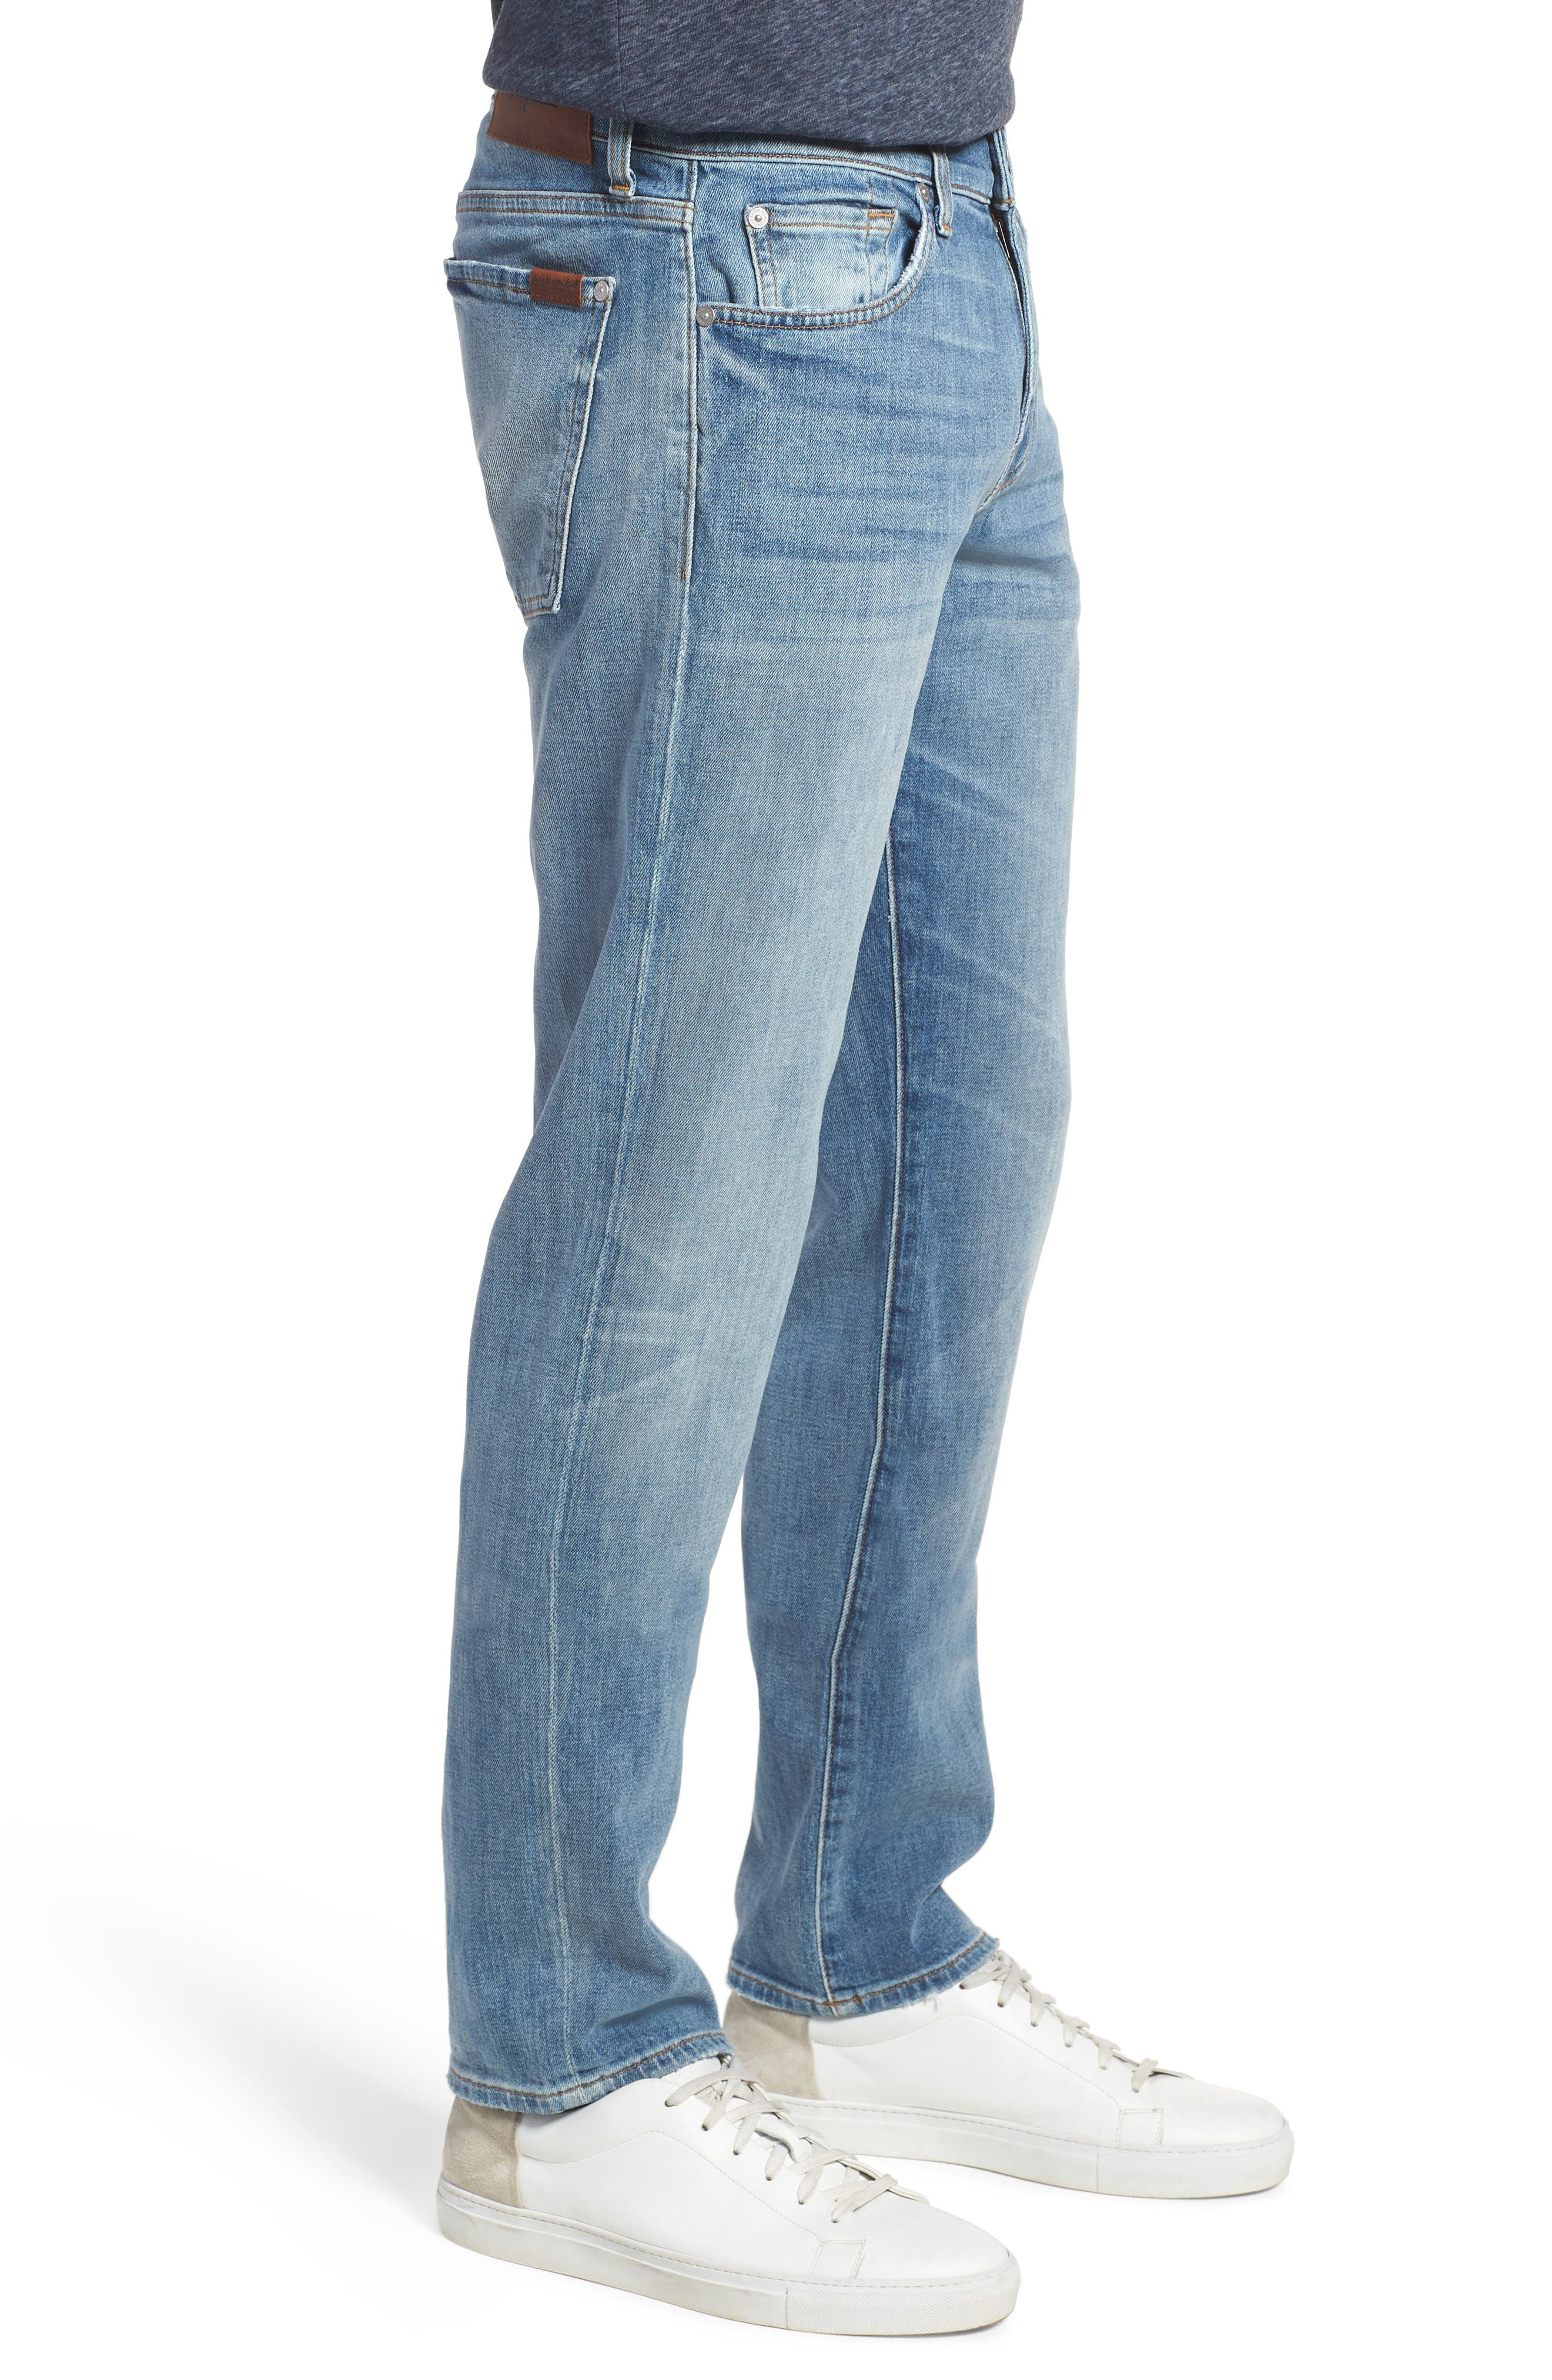 Slimmy Slim Fit Jeans,                             Alternate thumbnail 3, color,                             400